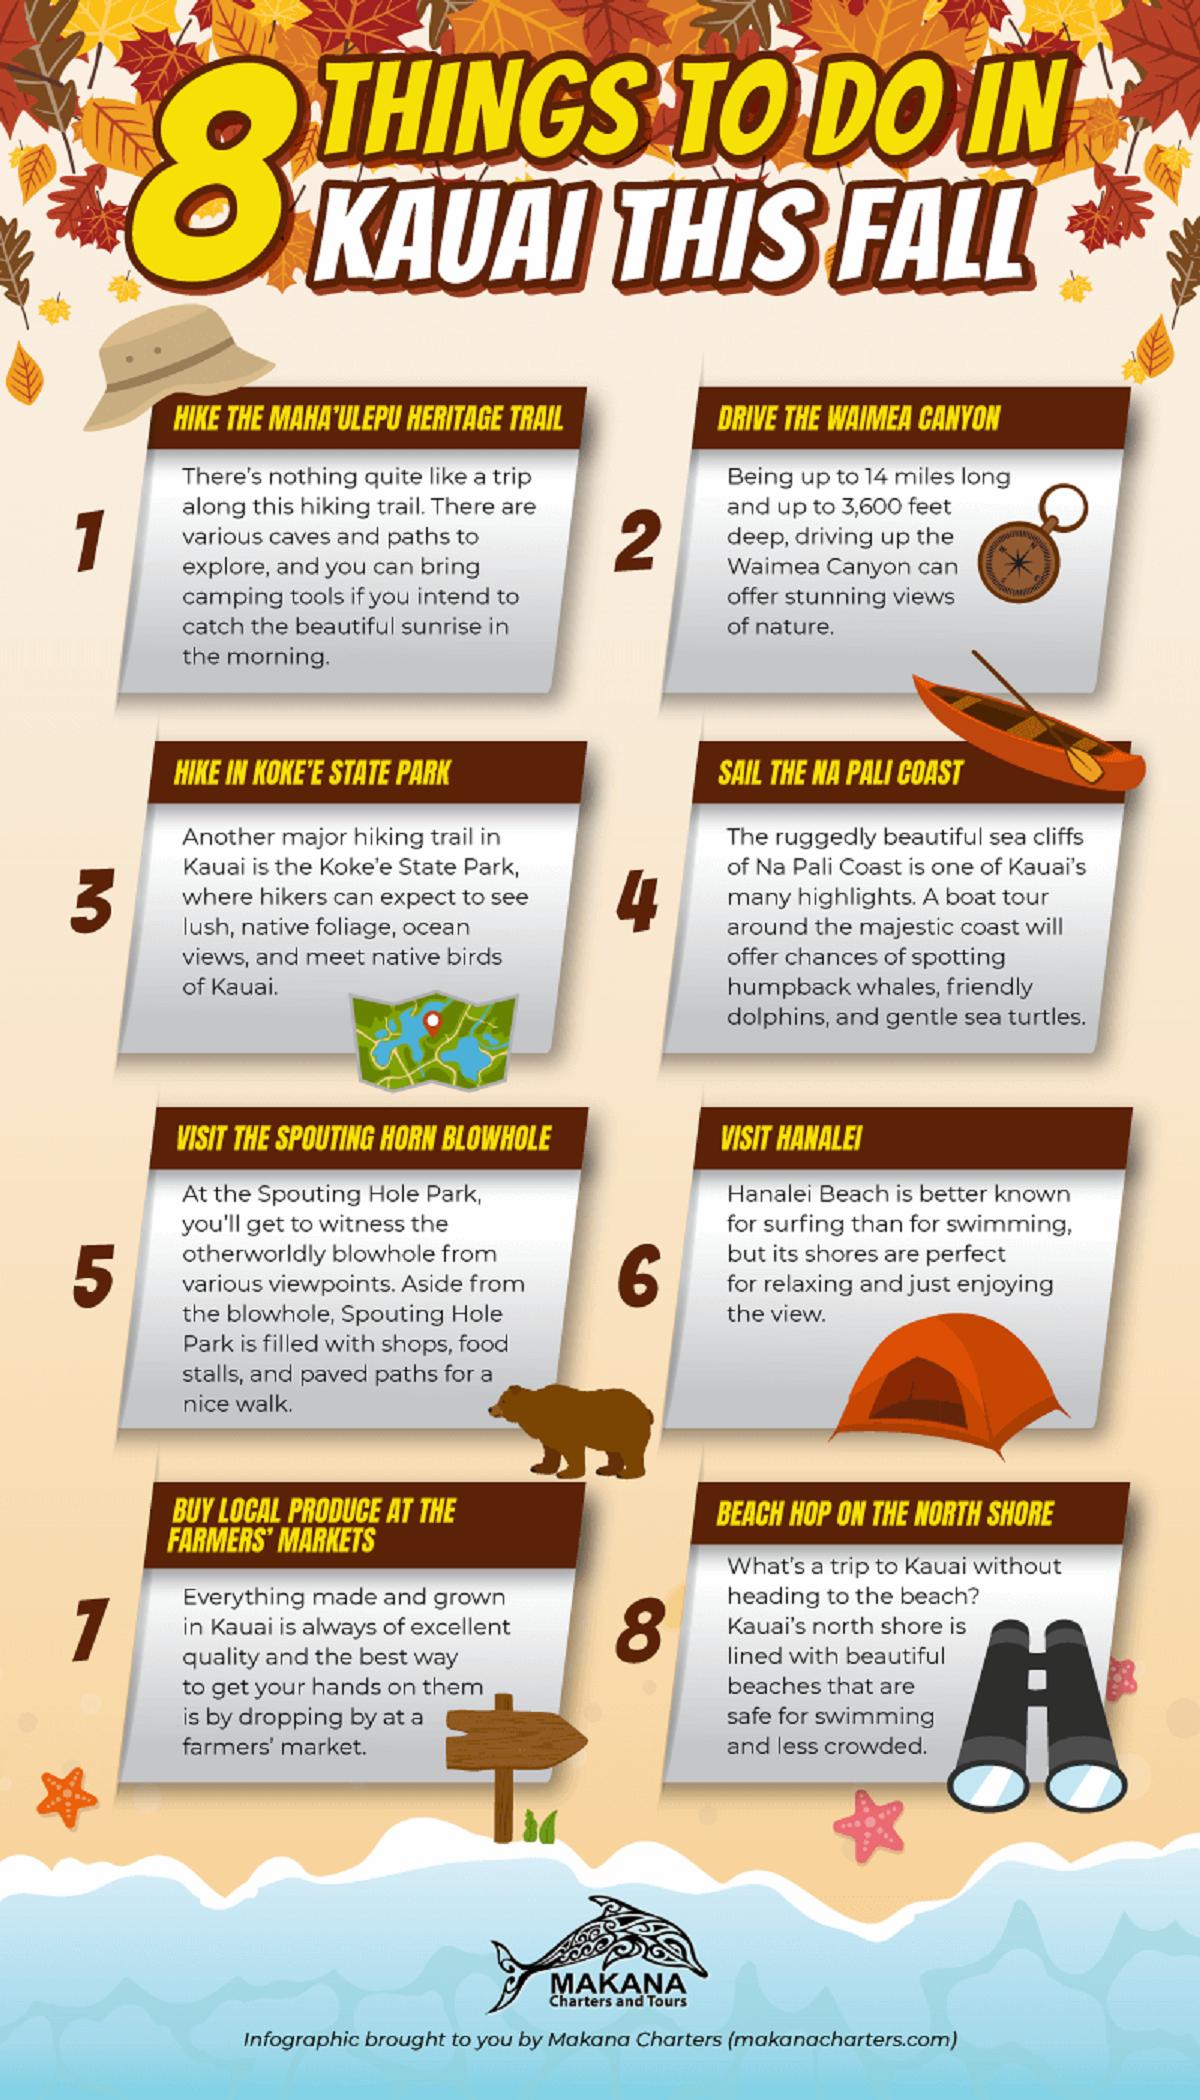 8-things-to-do-in-kauai-this-fall-infographic